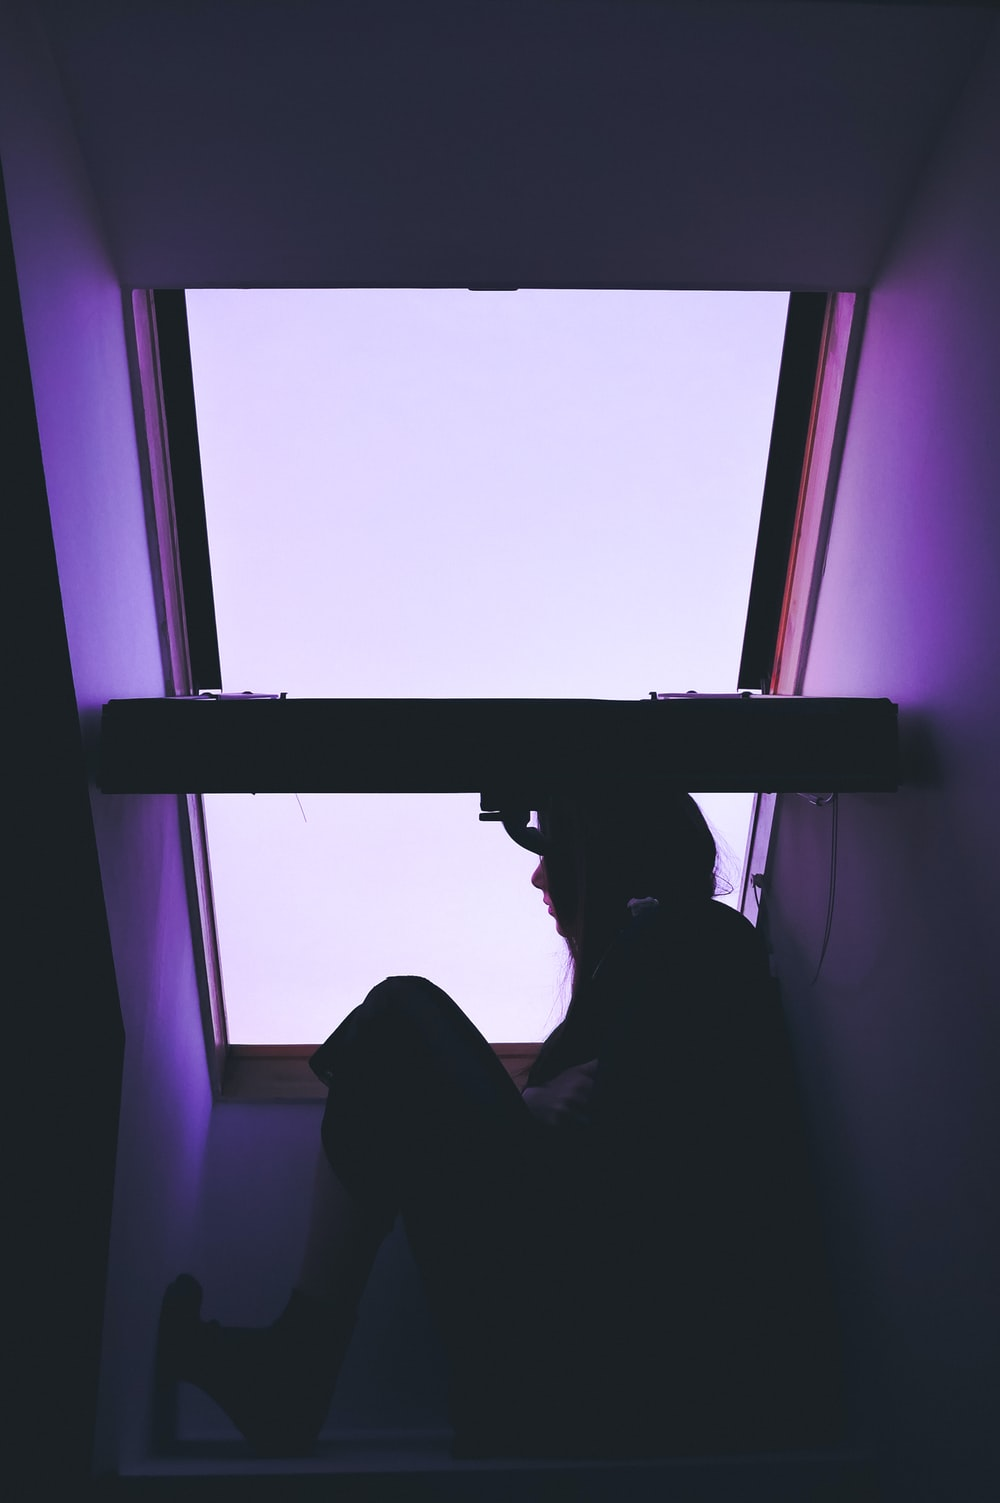 silhouette of person sitting near window